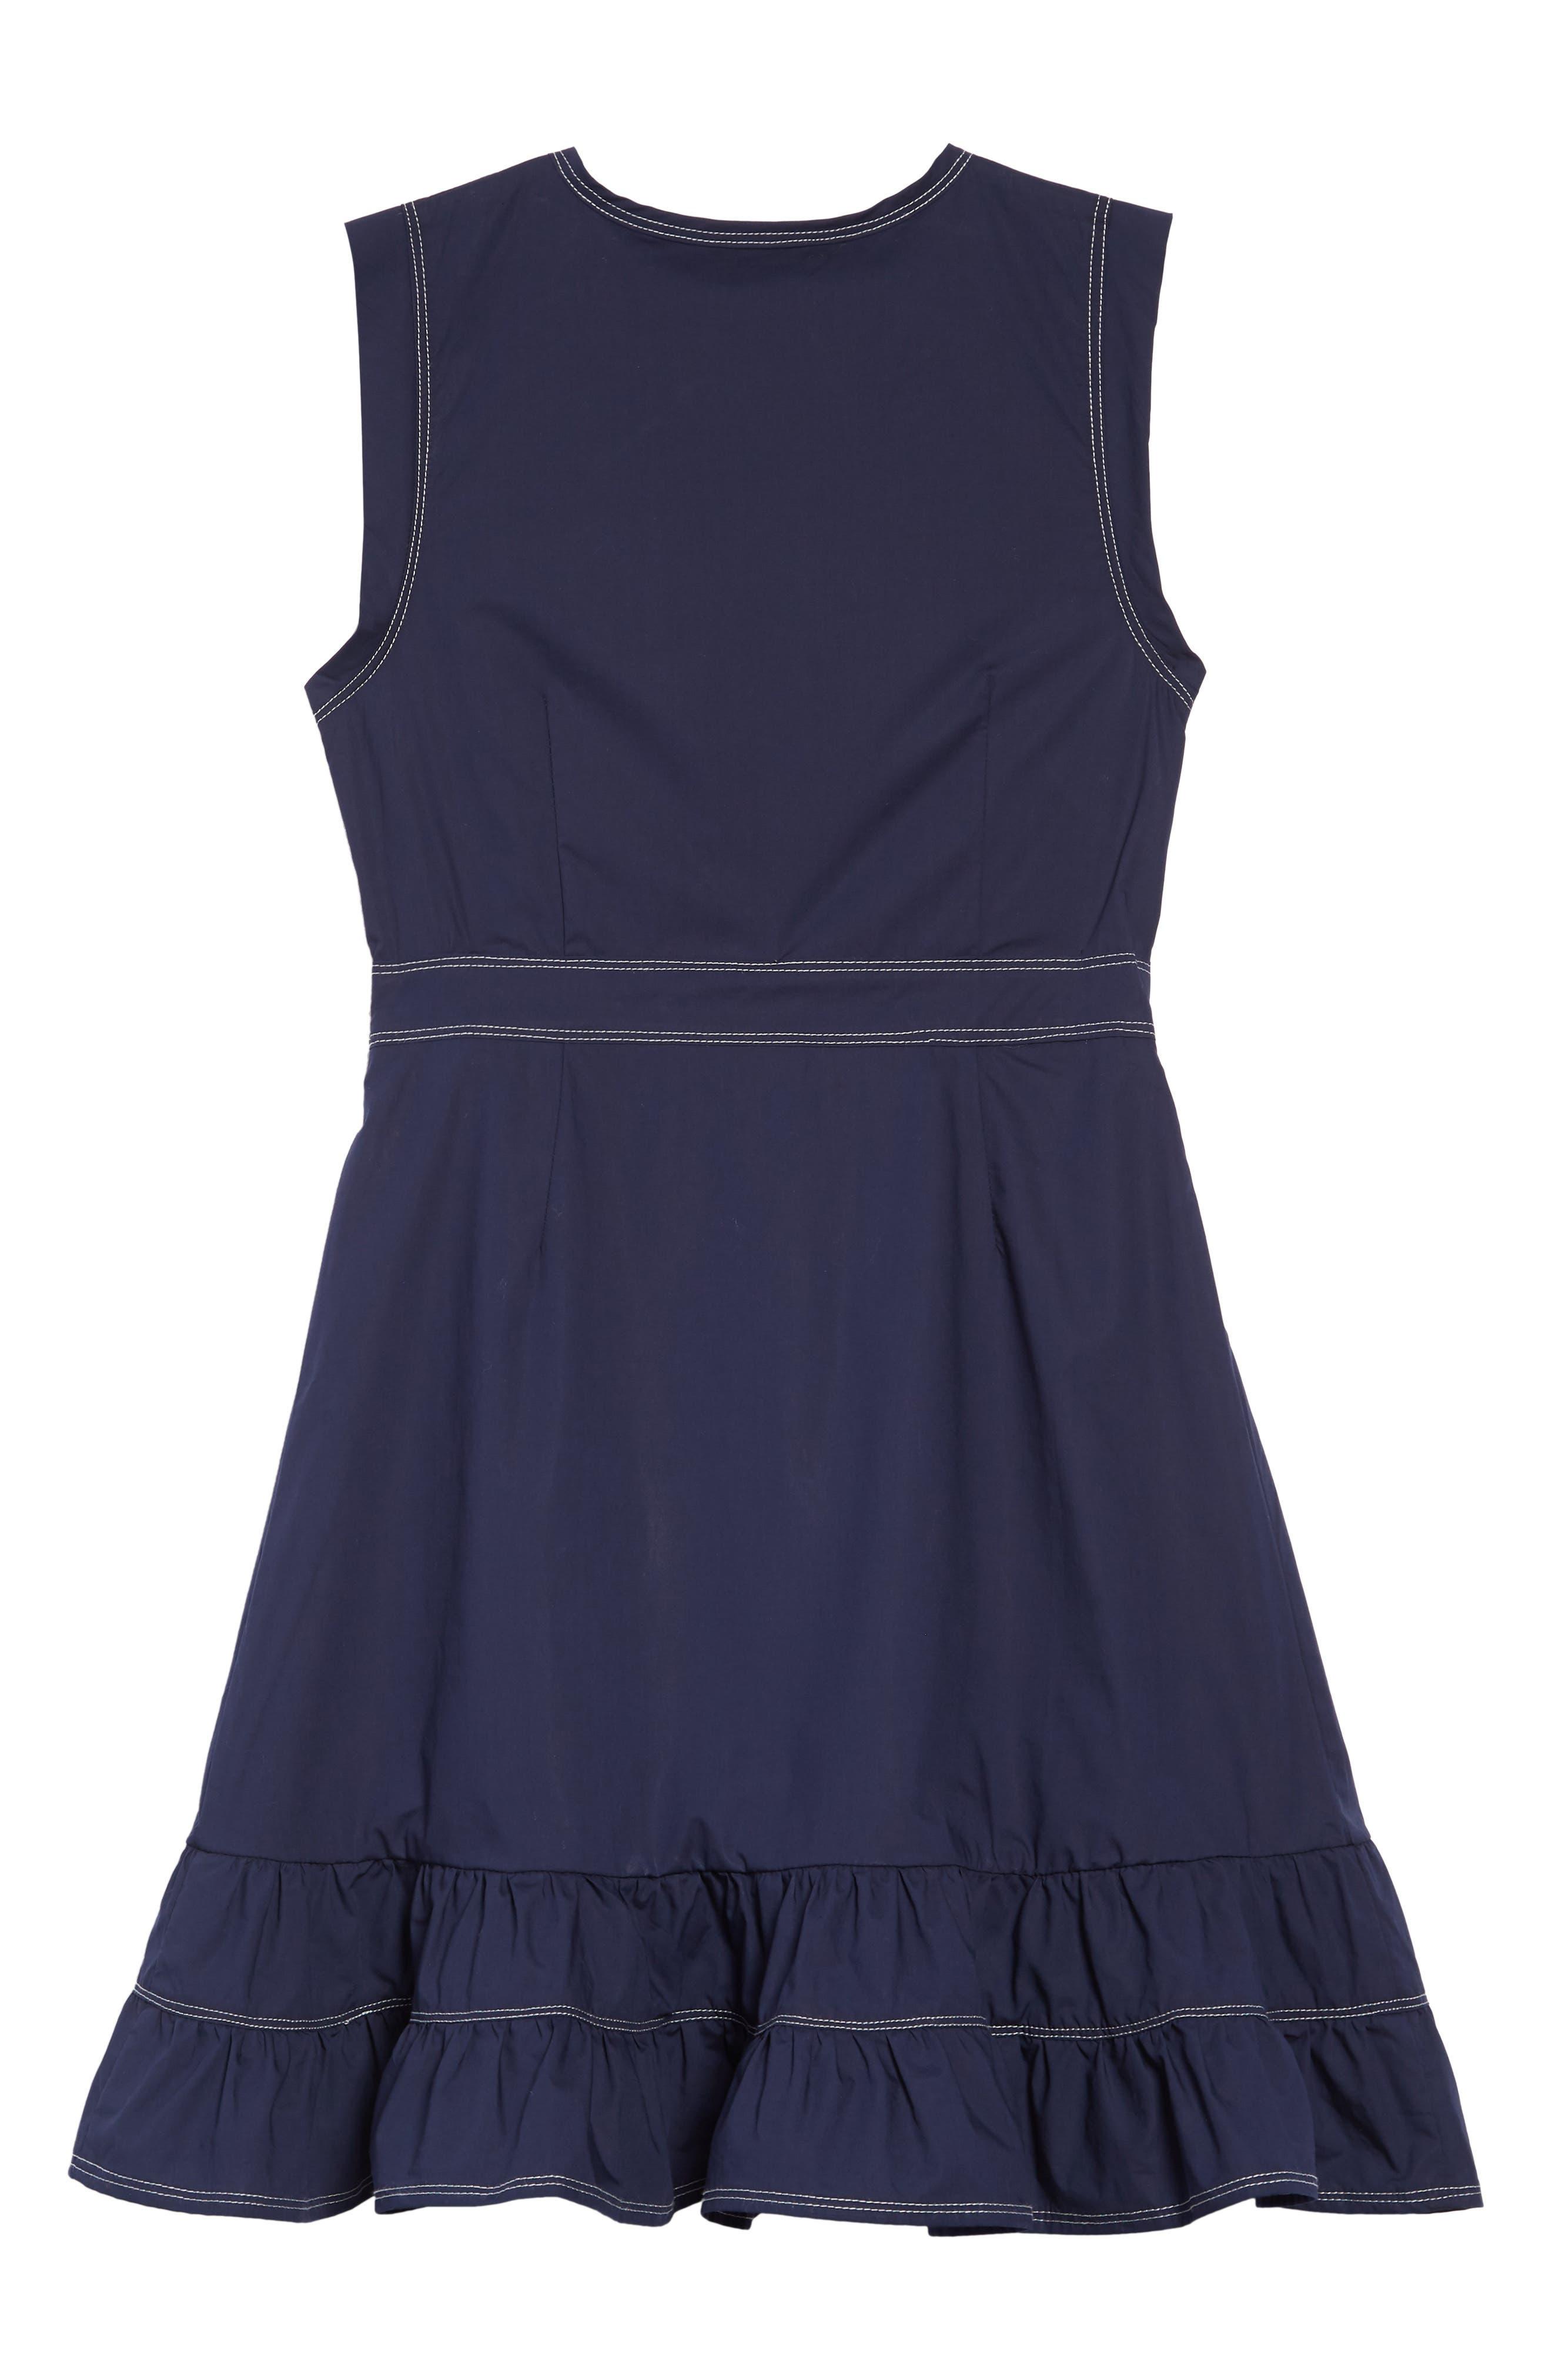 HABITUAL, Vanessa Wrap Dress, Alternate thumbnail 2, color, 410